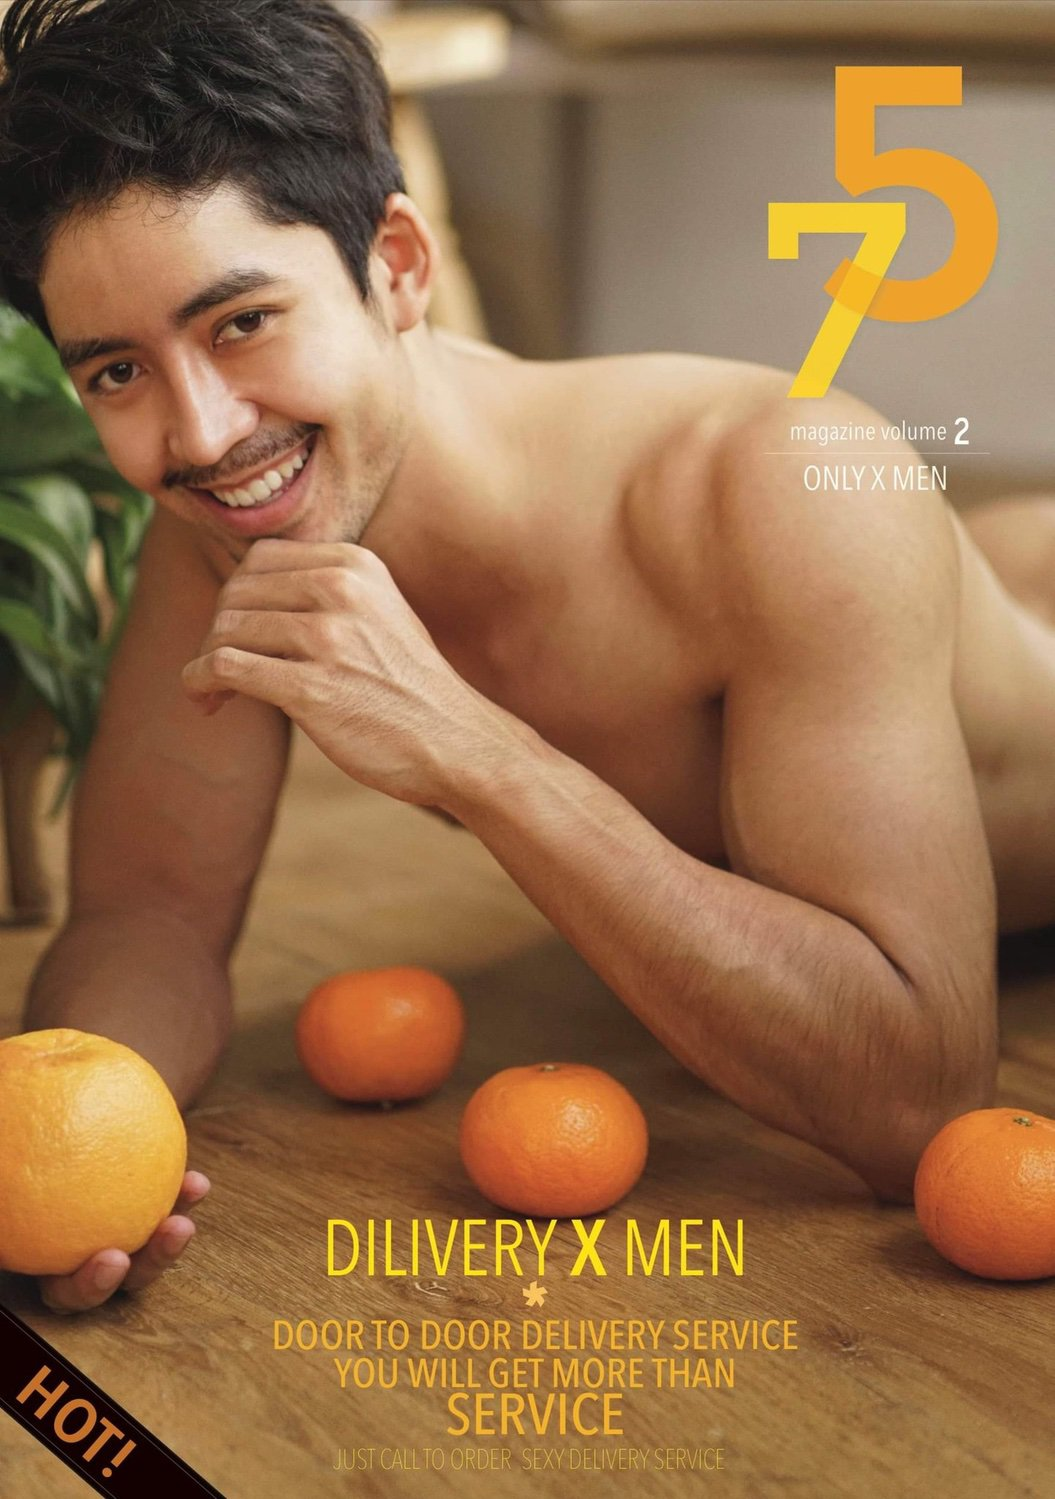 Cha Lham in 75 magazine #2